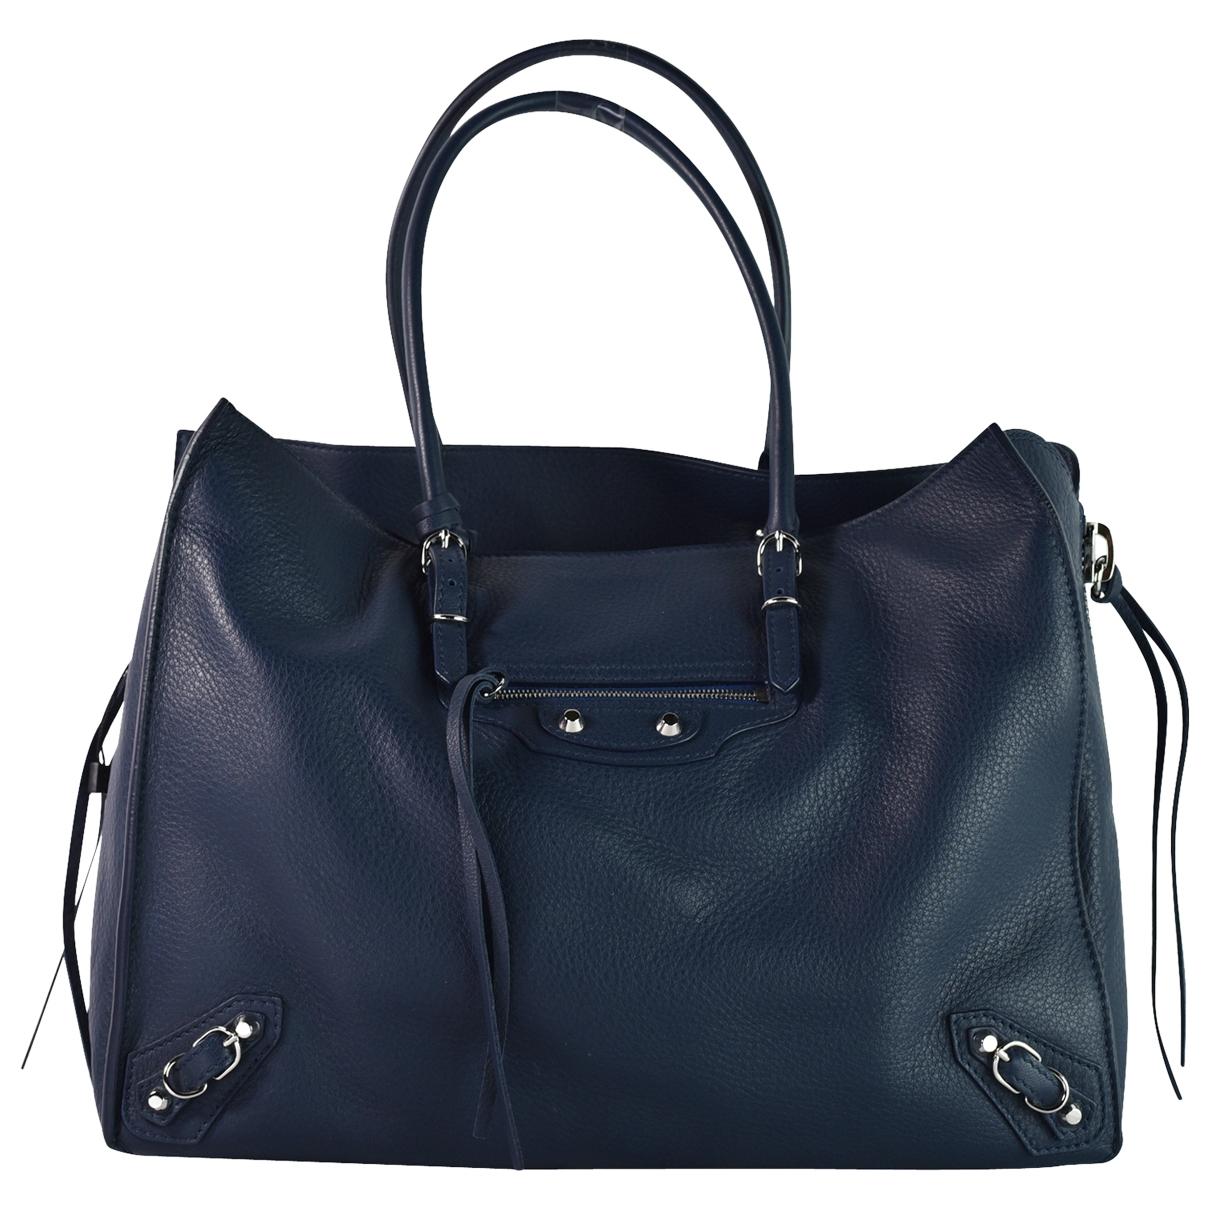 Balenciaga Papier Handtasche in  Blau Leder